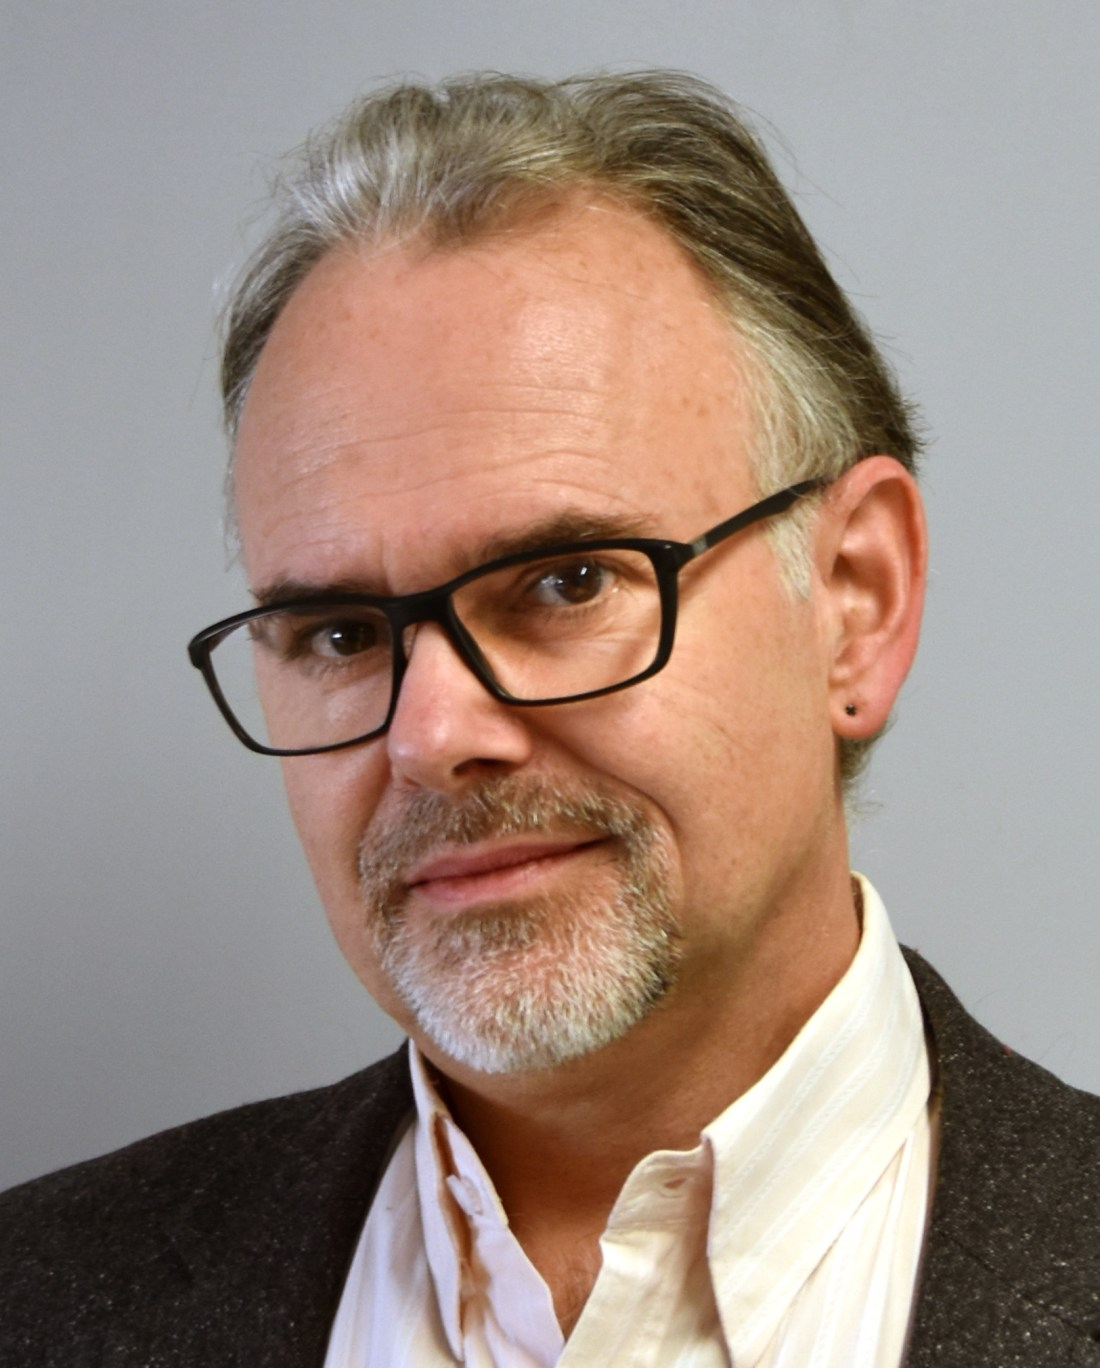 Jean-Marc HELLER